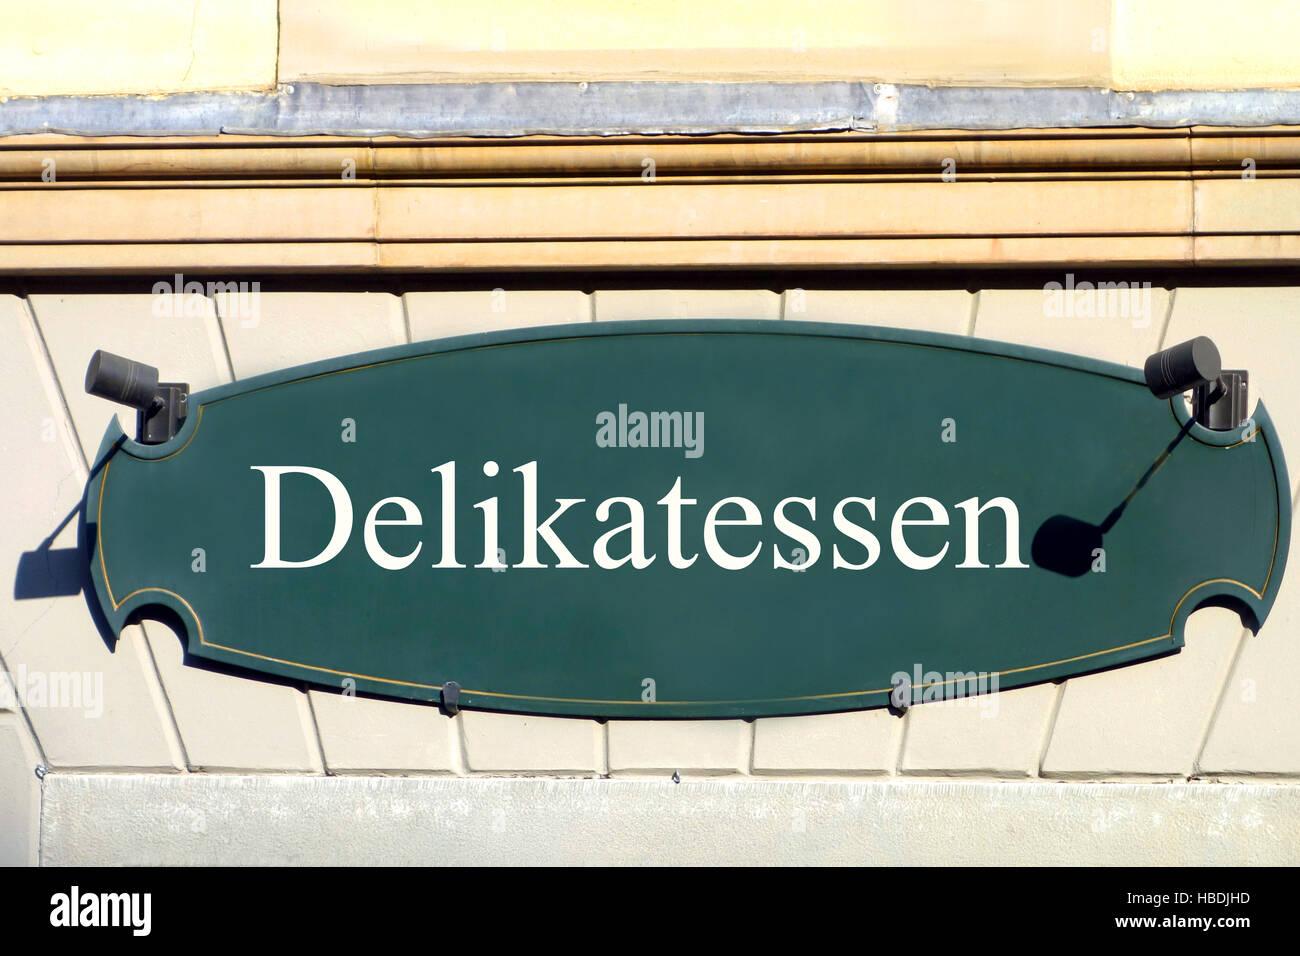 shield delikatessen - Stock Image